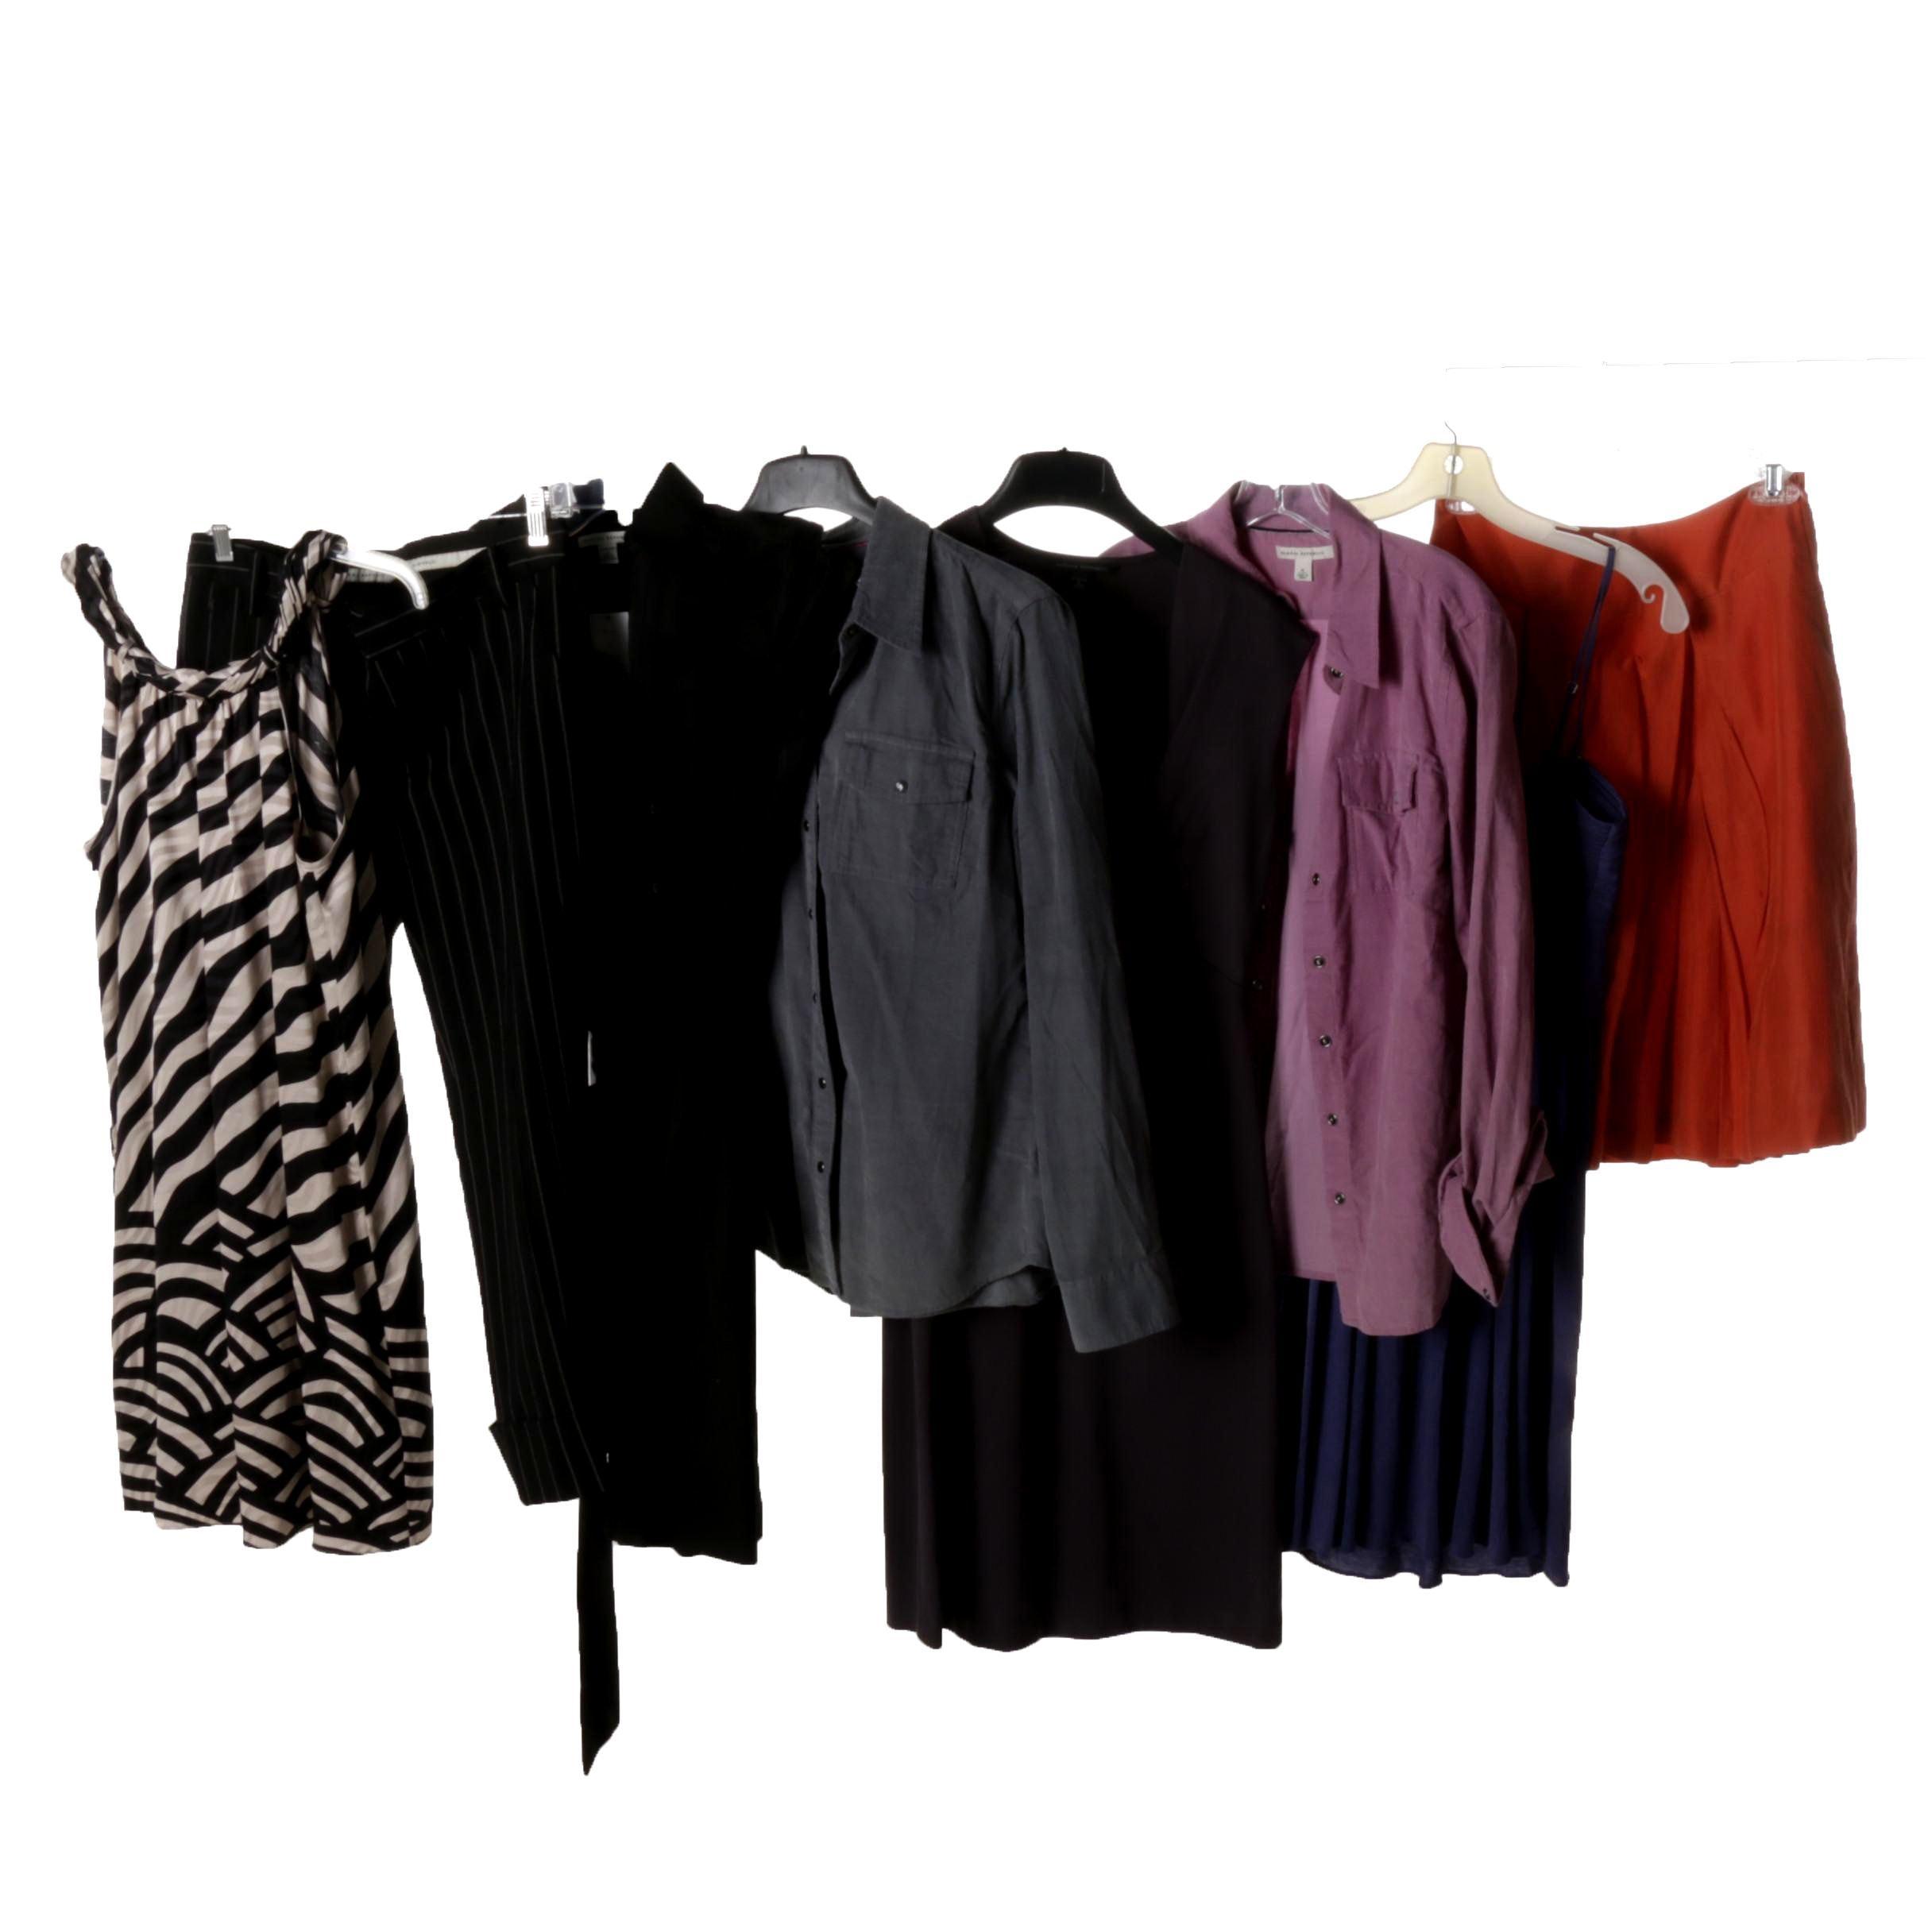 Women's Banana Republic Clothing Assortment